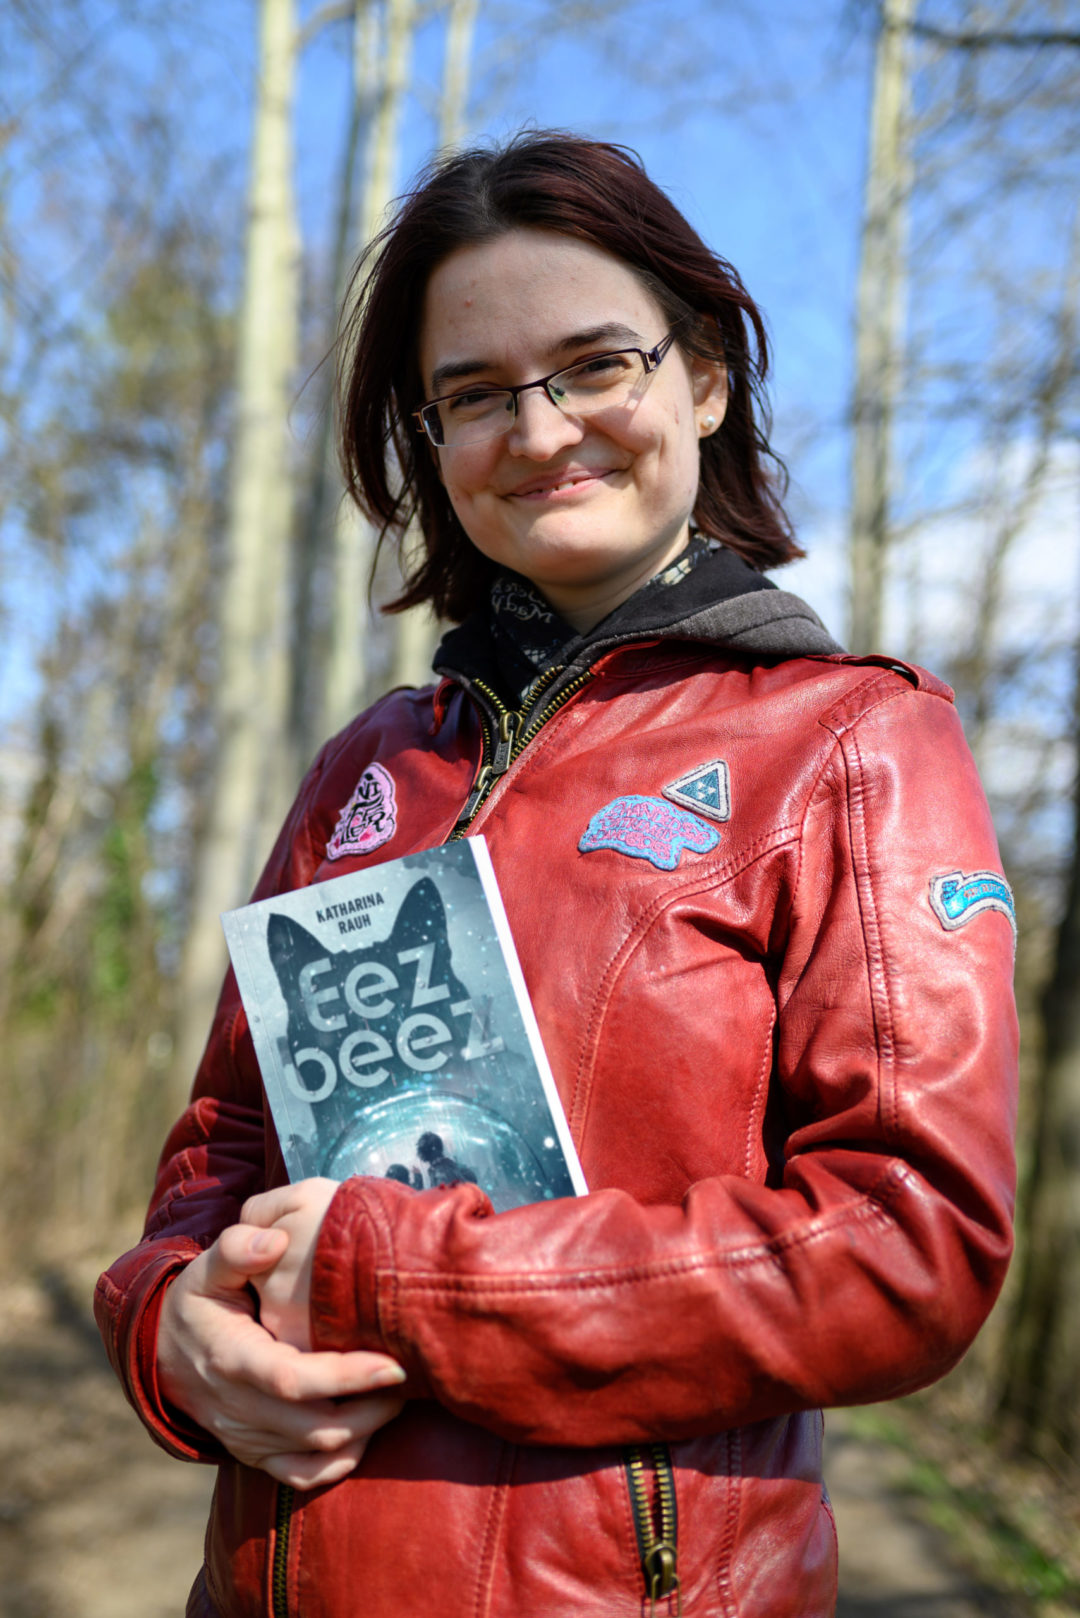 Katharina in roter Jacke mit Buch im Wald